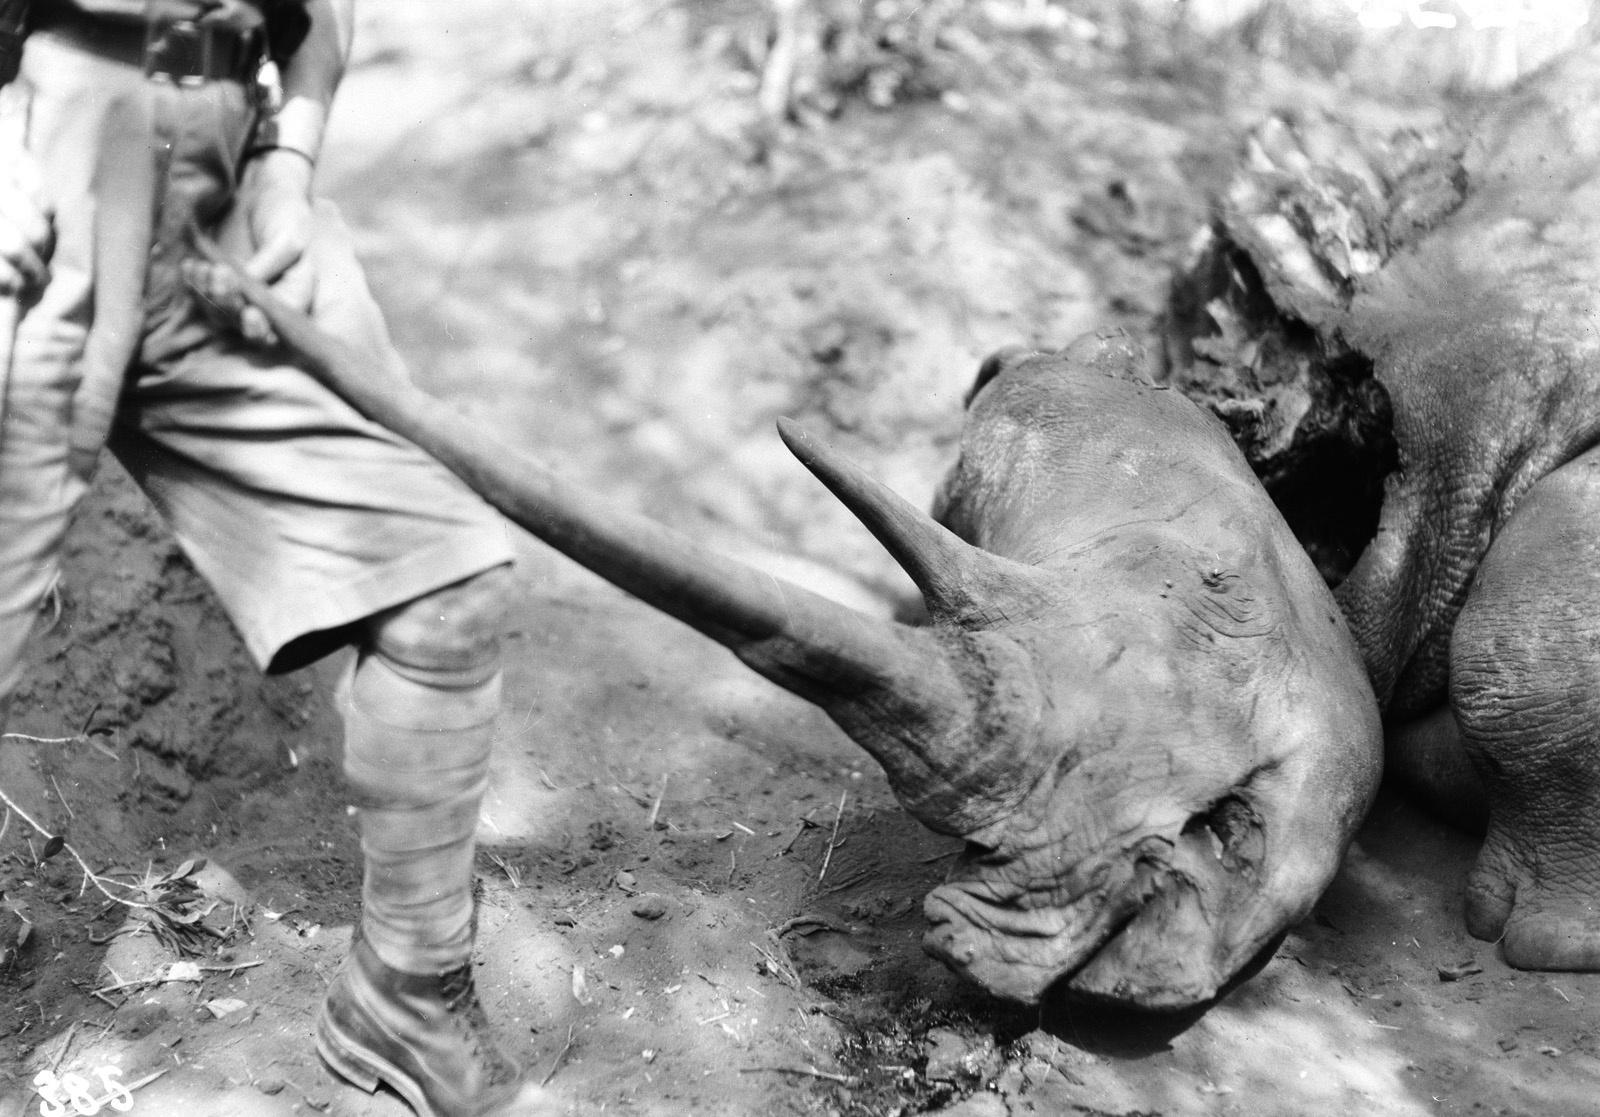 Квазулу-Наталь. Умфолози. Мертвый носорог